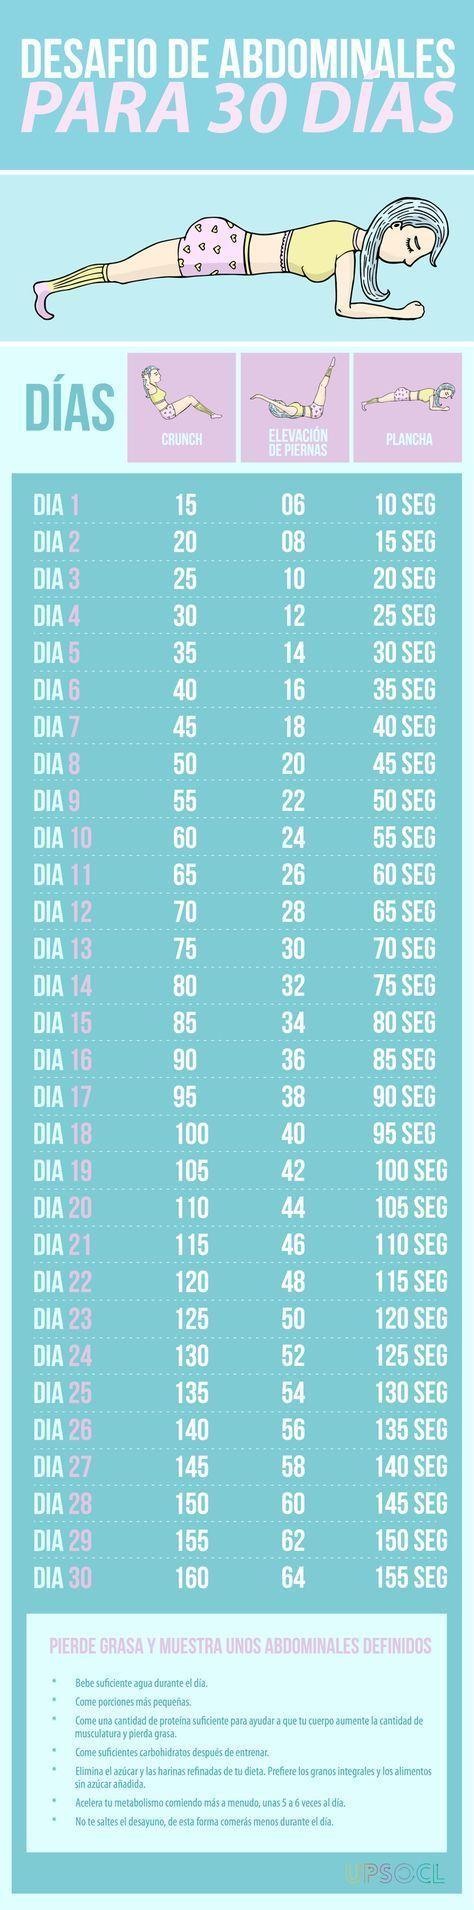 desafios de 30 dias, ¿te animas?